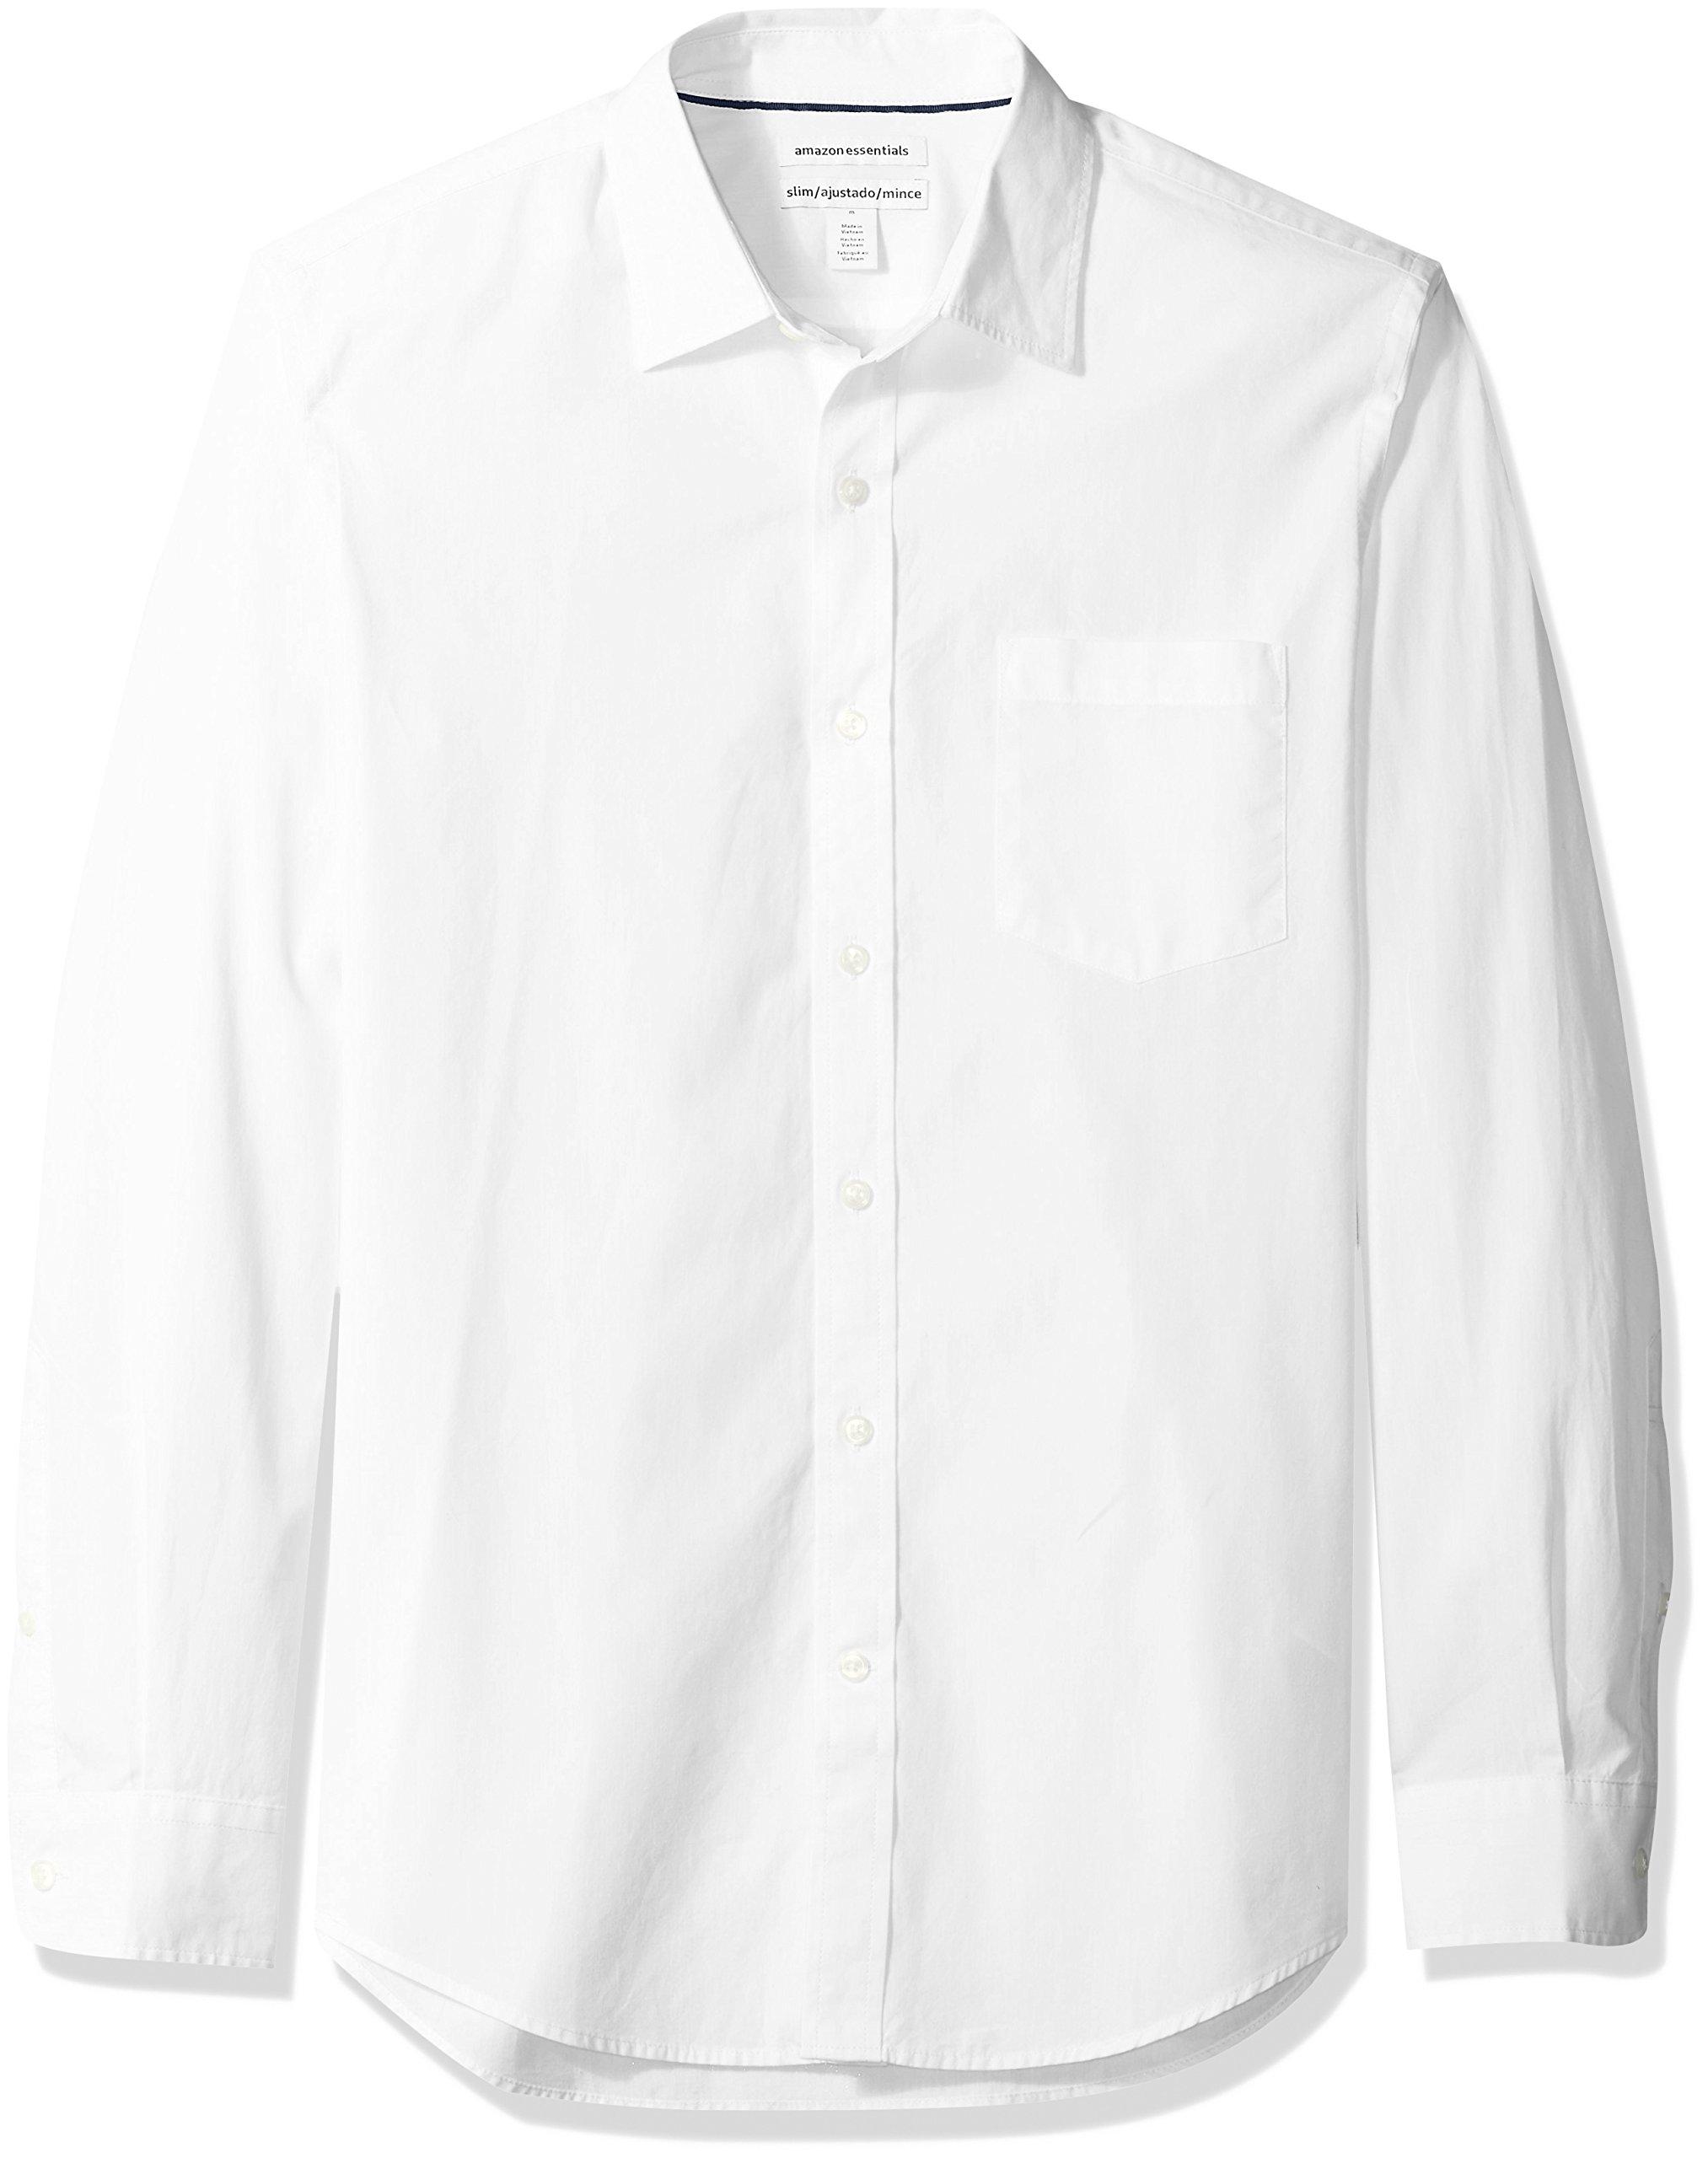 Amazon Essentials Men's Slim-Fit Long-Sleeve Poplin Shirt, White, Large